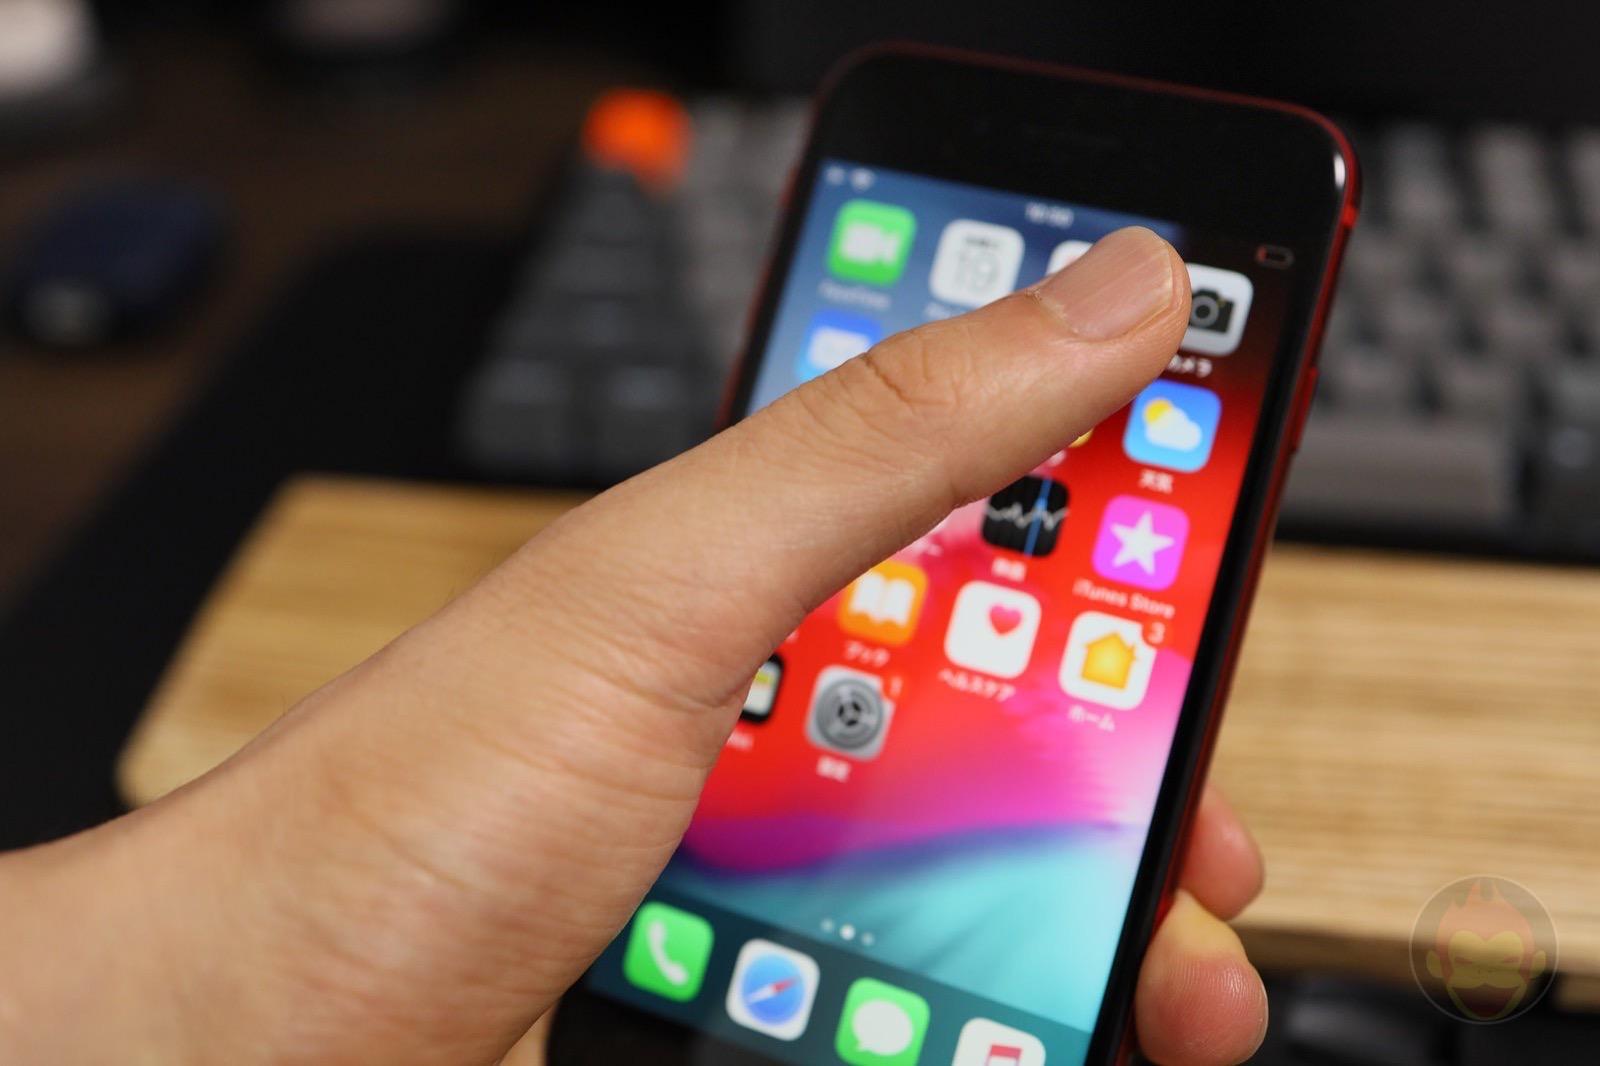 Iphone 8 one hand usage 01